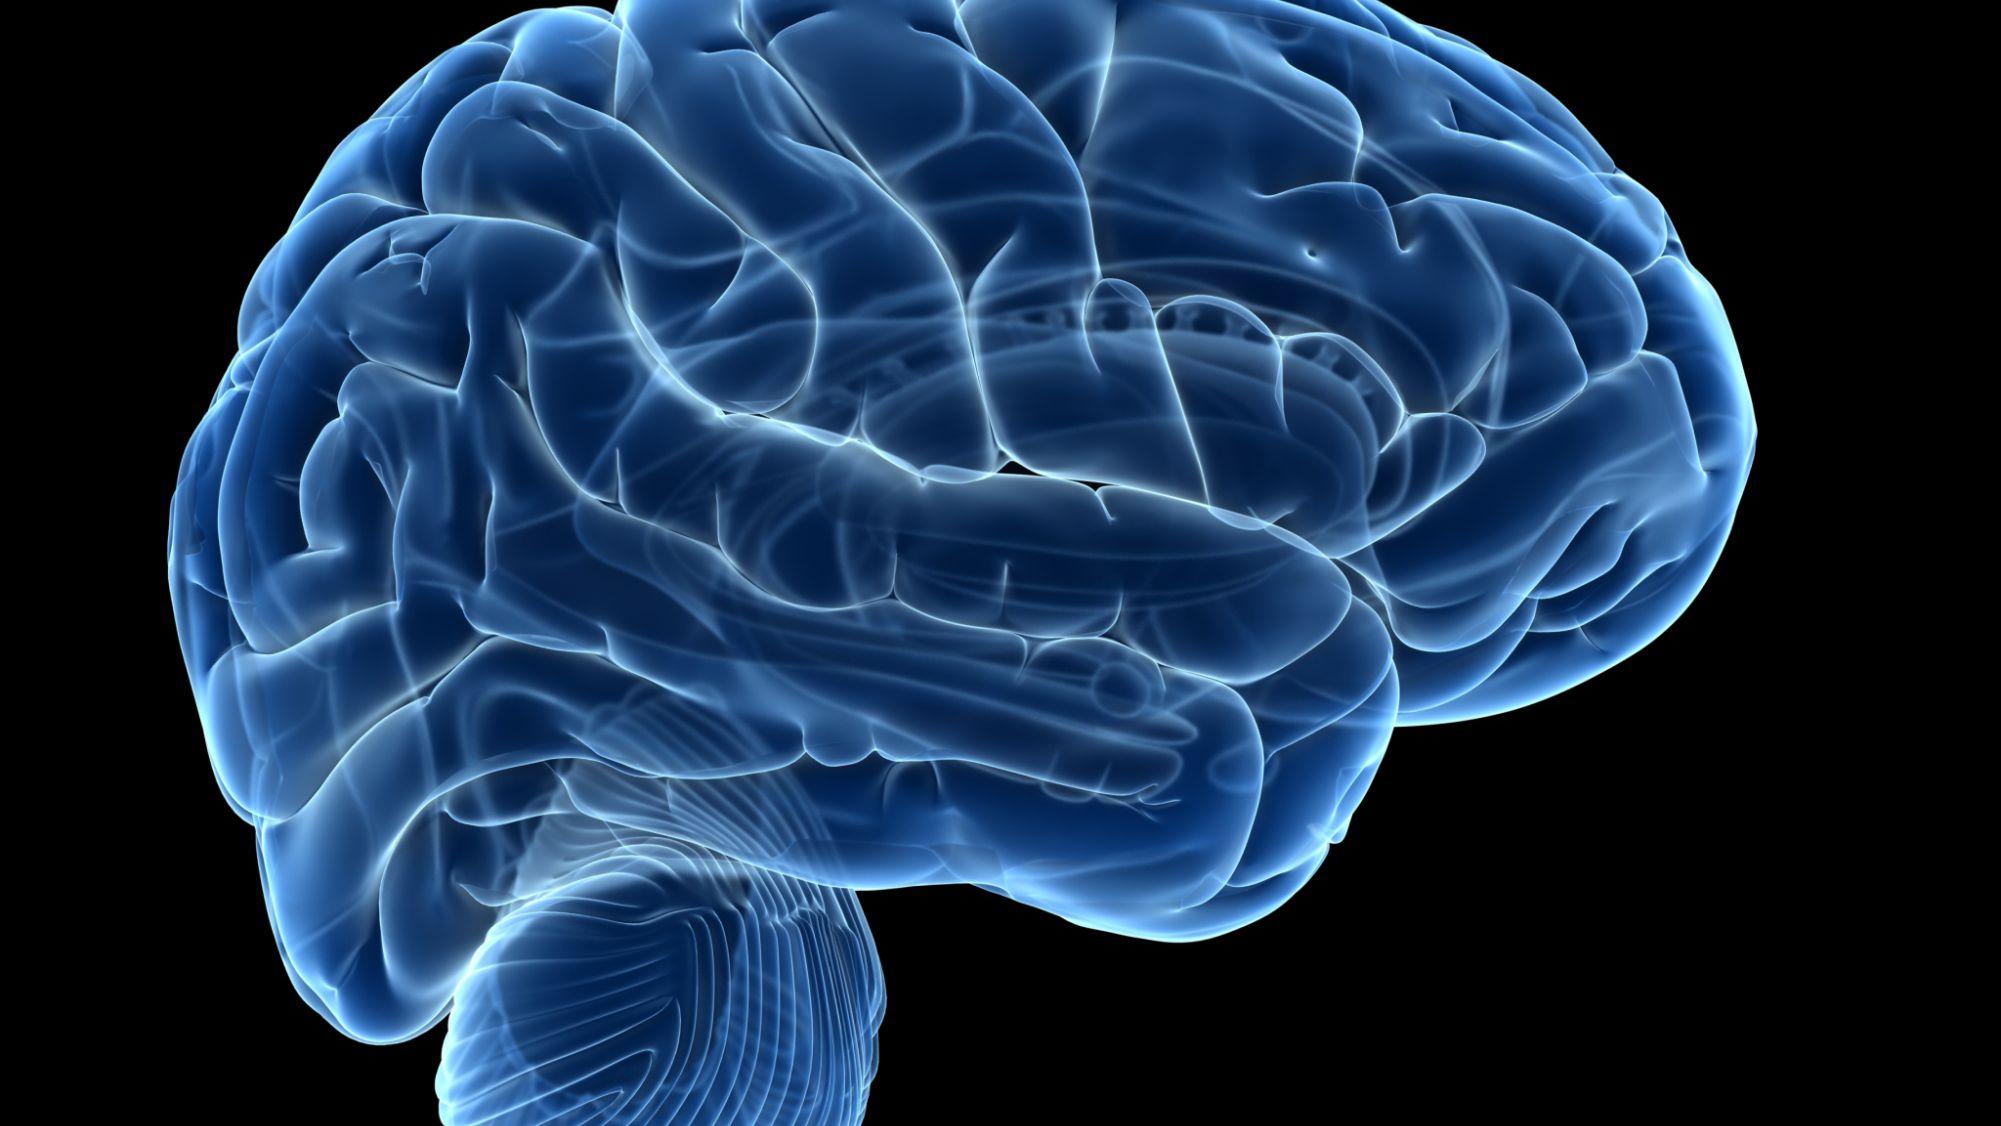 Marine Study Examines Stress Brain >> 5 Brain Exercises To Strengthen Your Mind